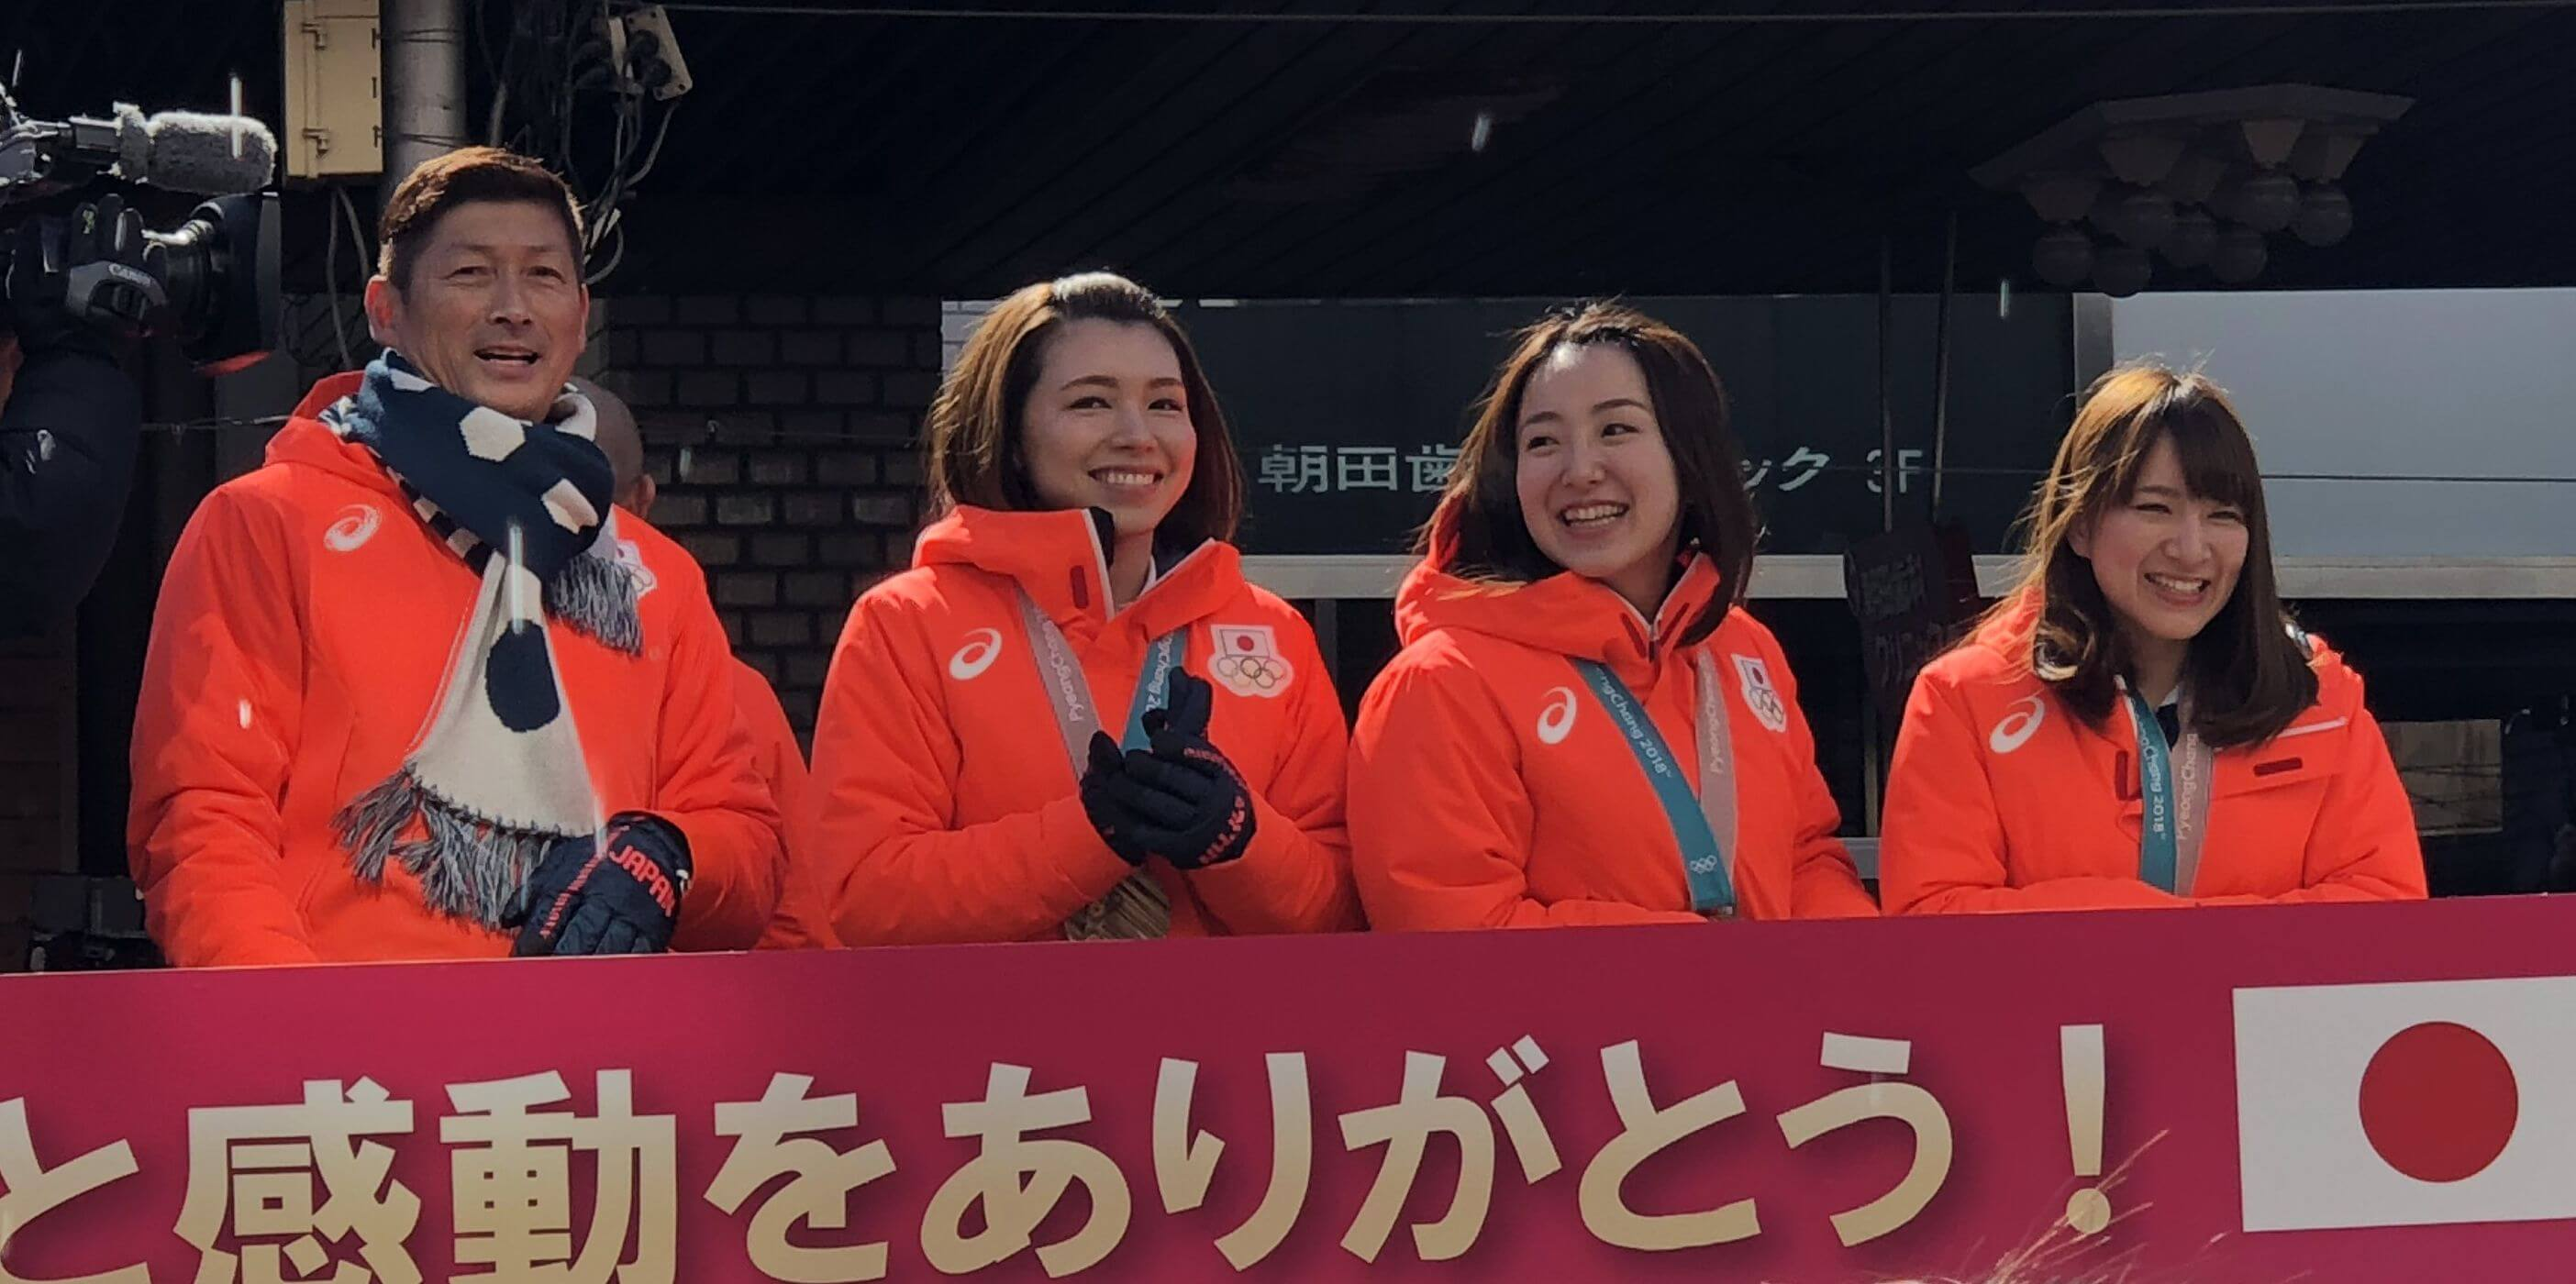 LS北見凱旋パレードの藤澤五月・本橋麻里・鈴木夕湖1